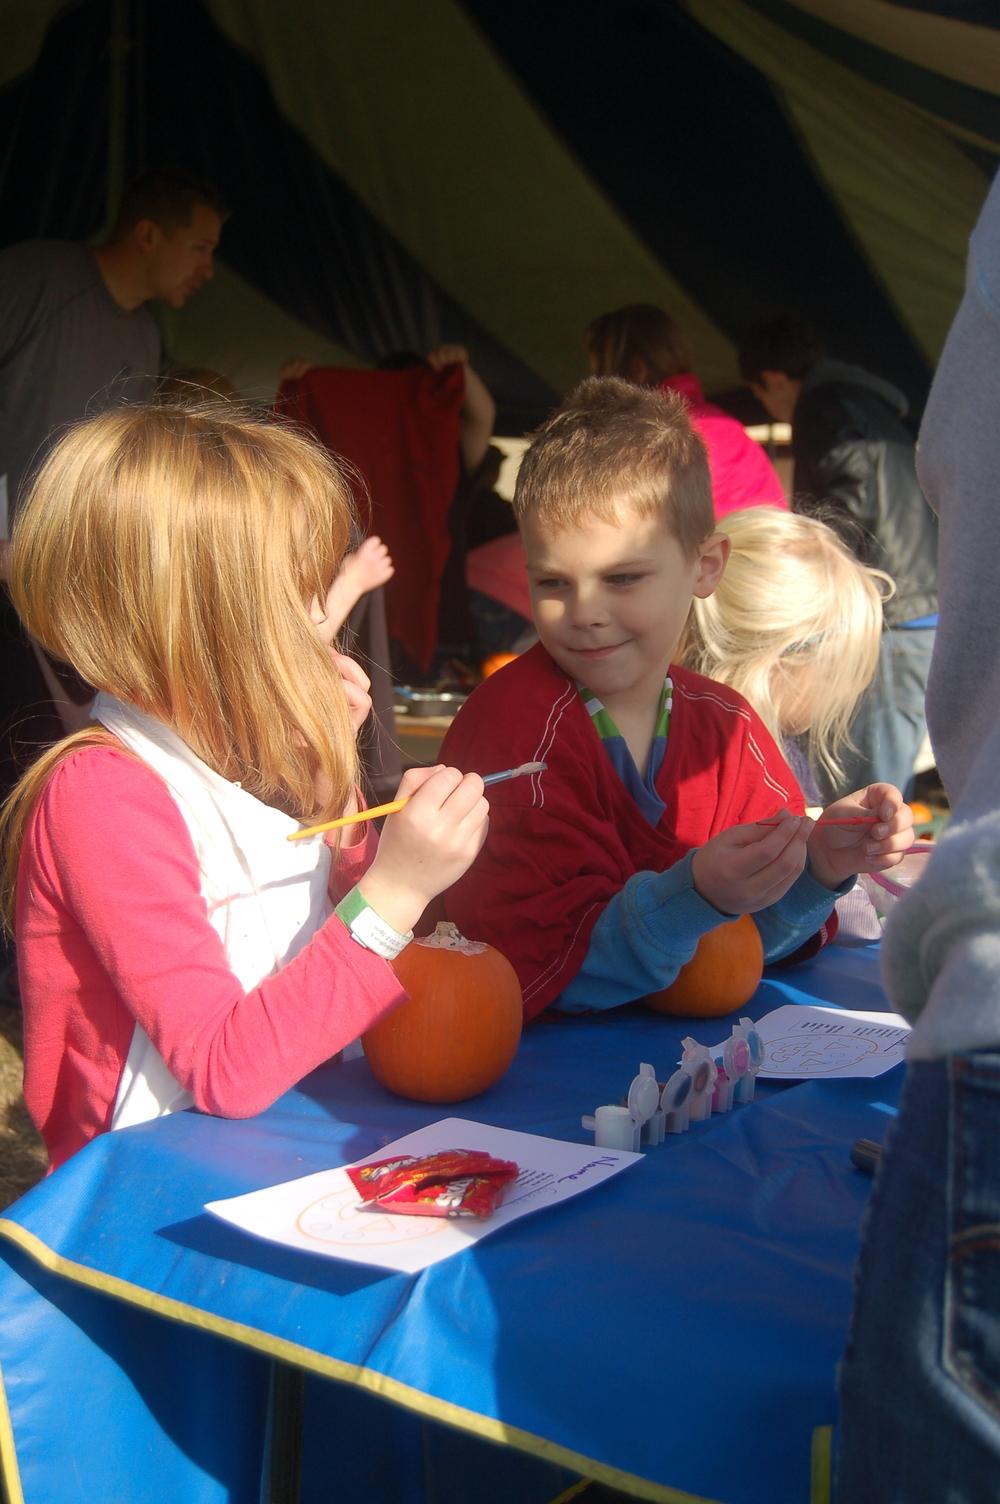 Painting Pumpkins at the Pumpkin Launch